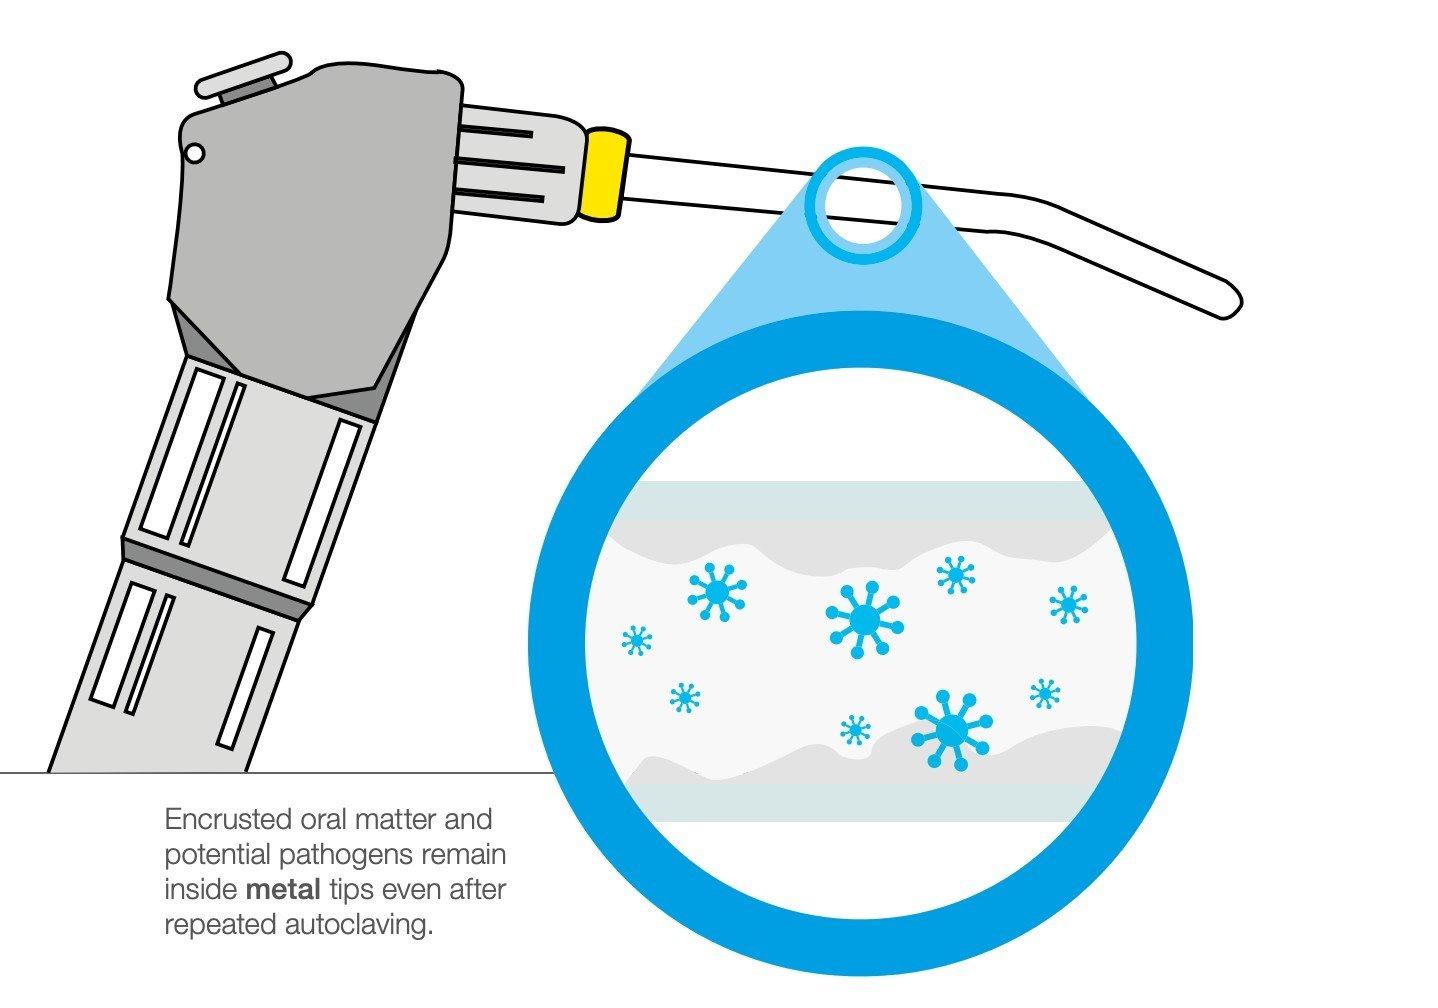 pathogens remain in metal syringe tips virtu tips